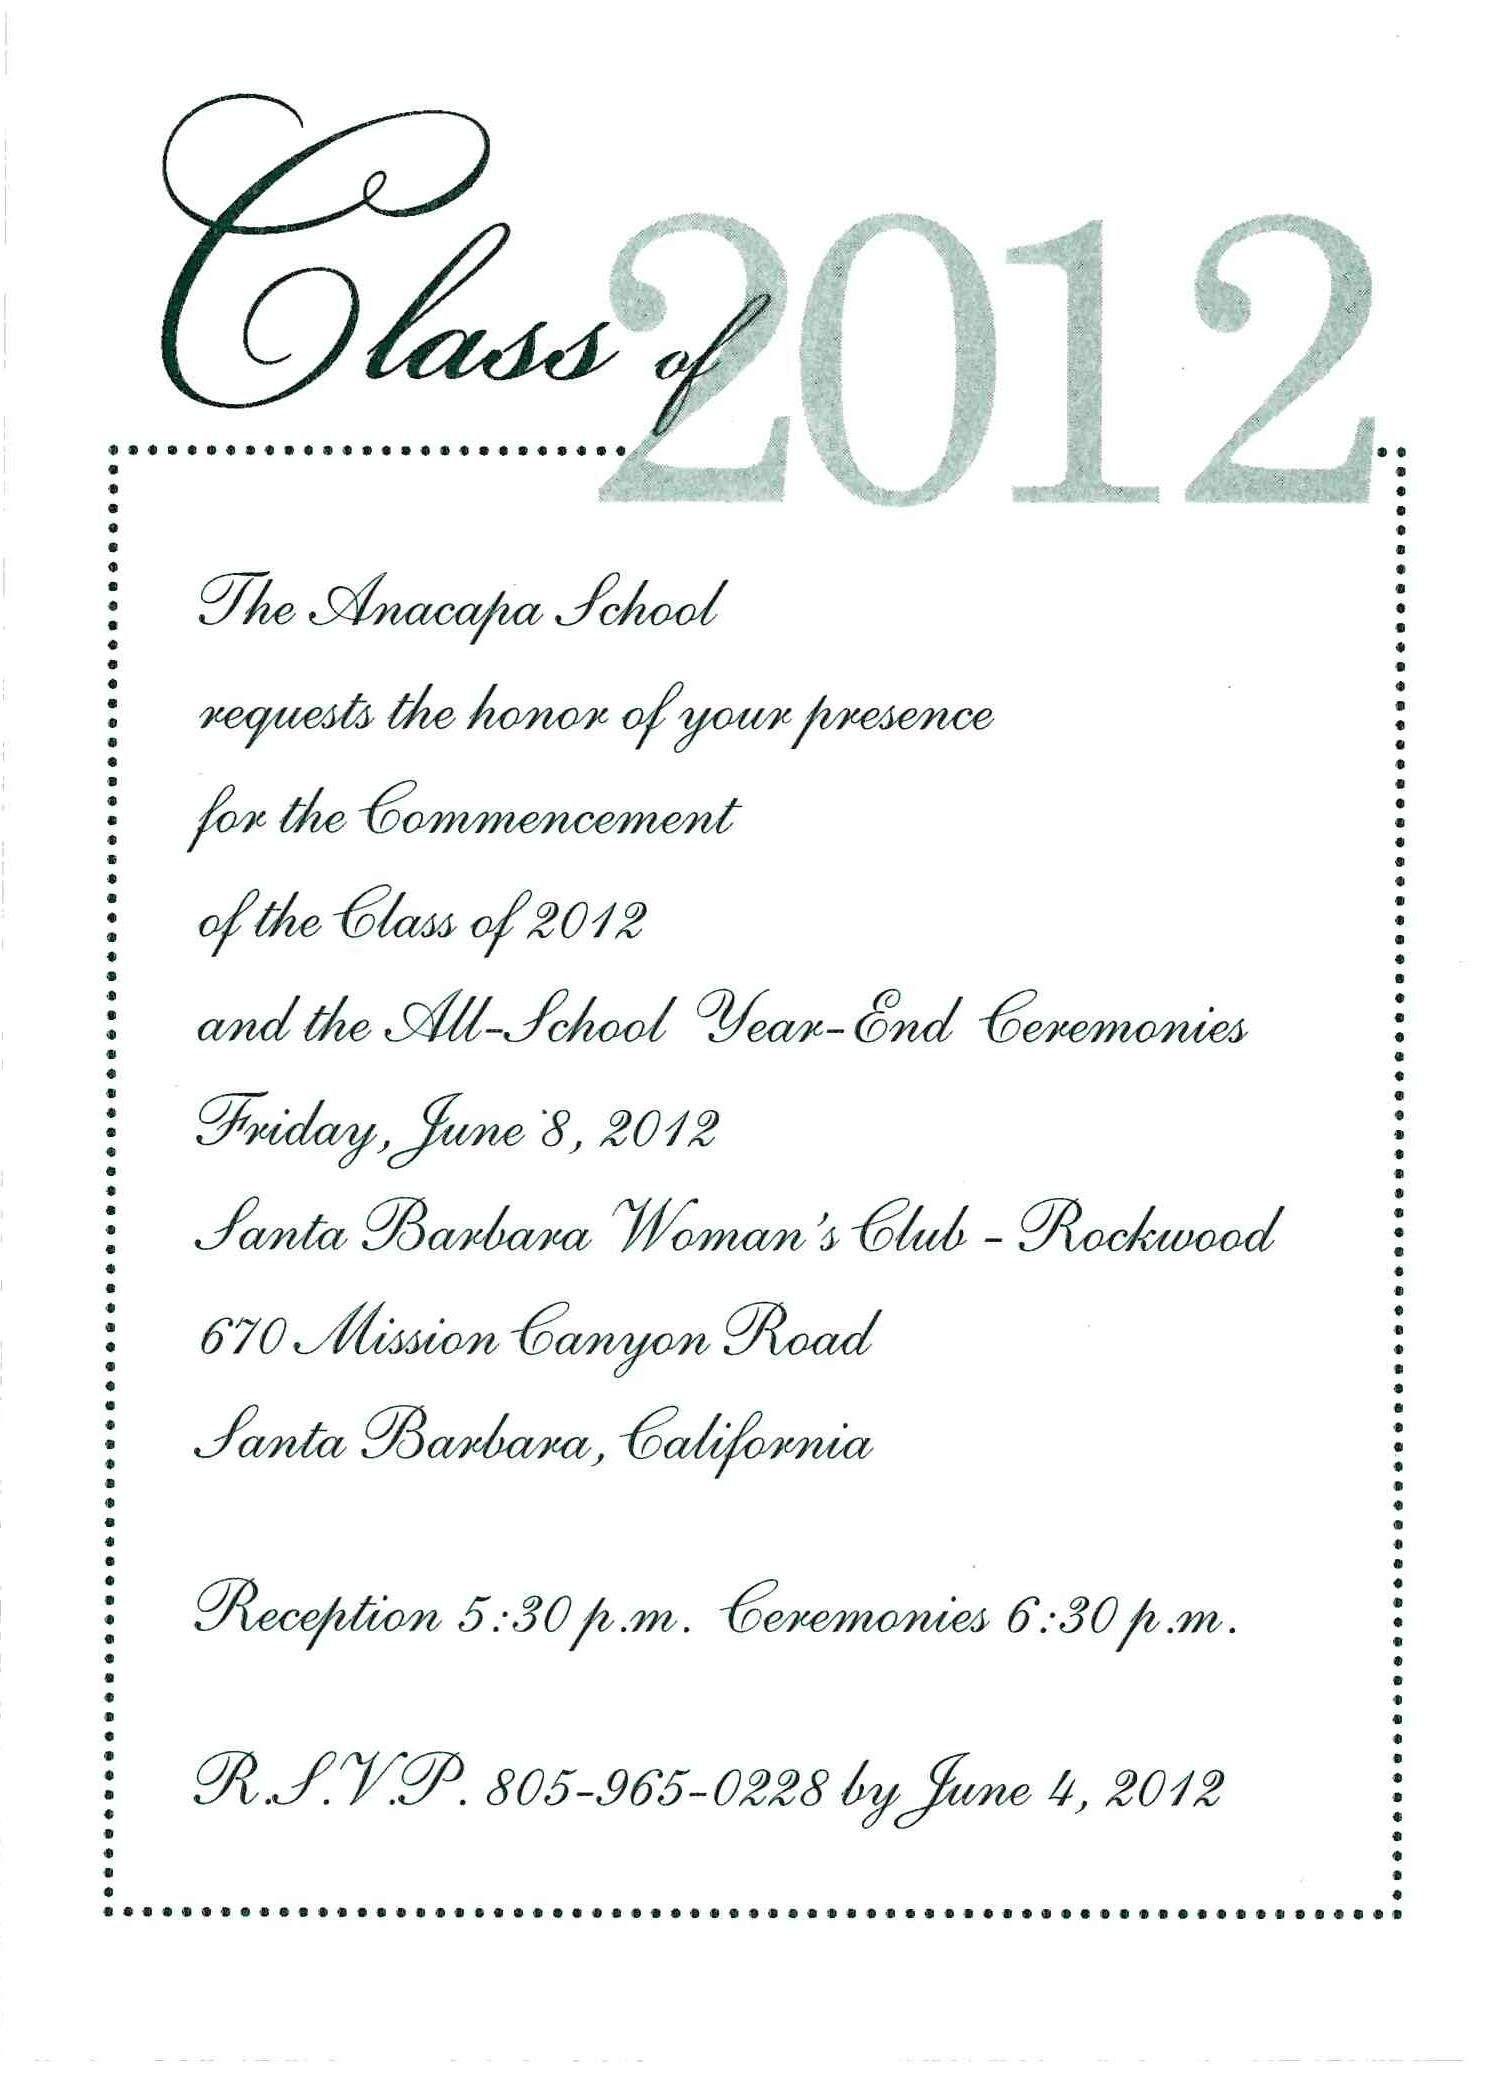 Free Printable Graduation Invitations | Free Printable Graduation - Free Printable Graduation Invitations